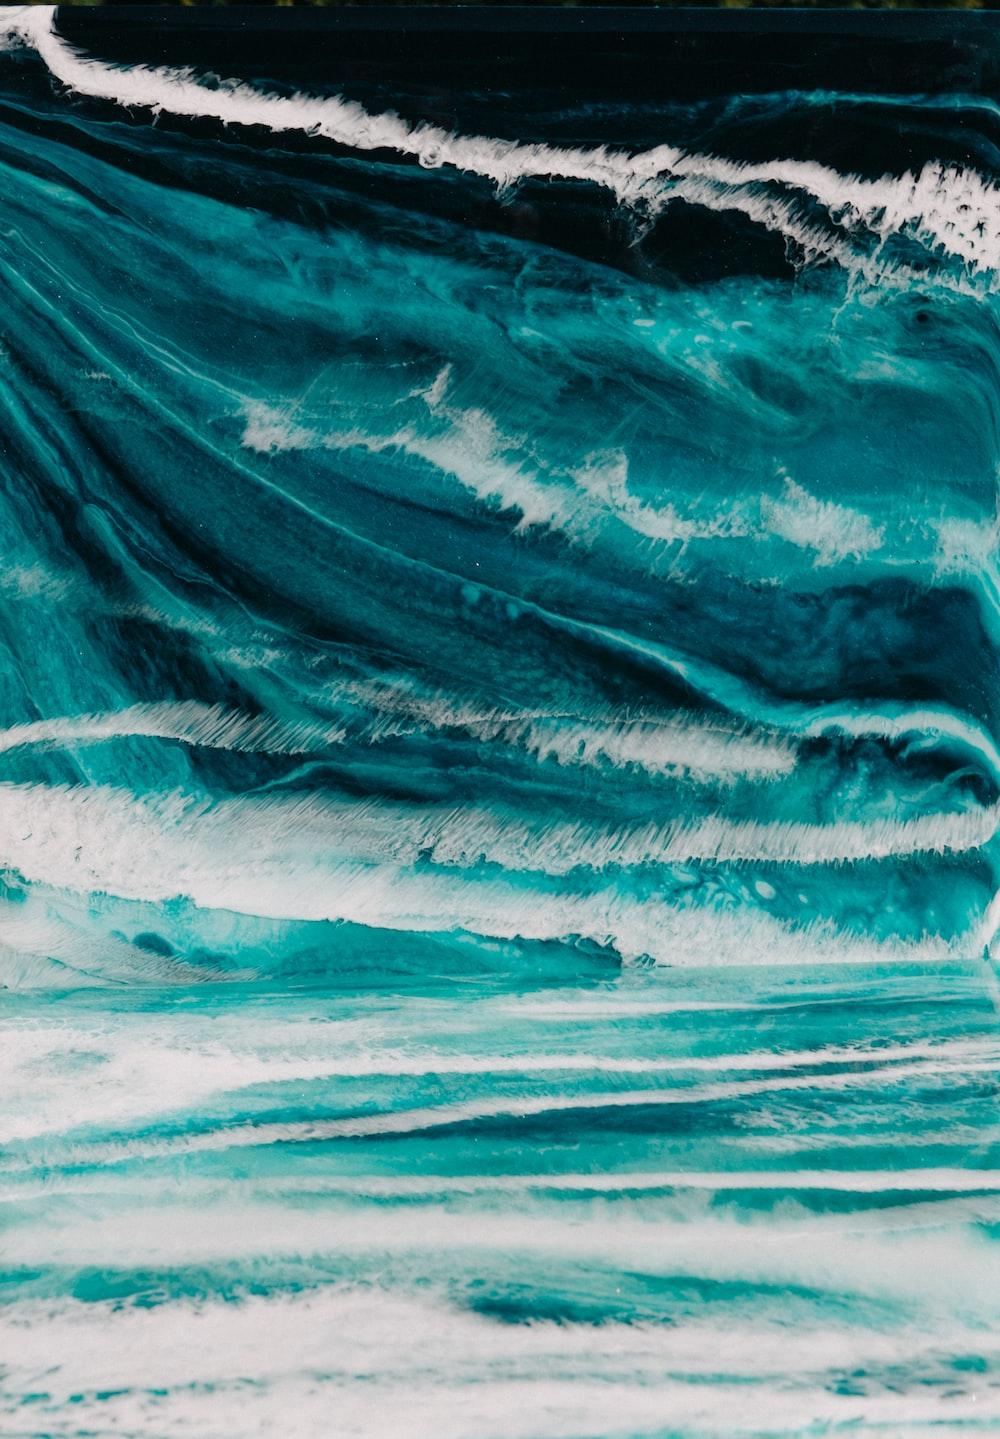 Ocean Wallpapers Free Hd Download 500 Hq Unsplash